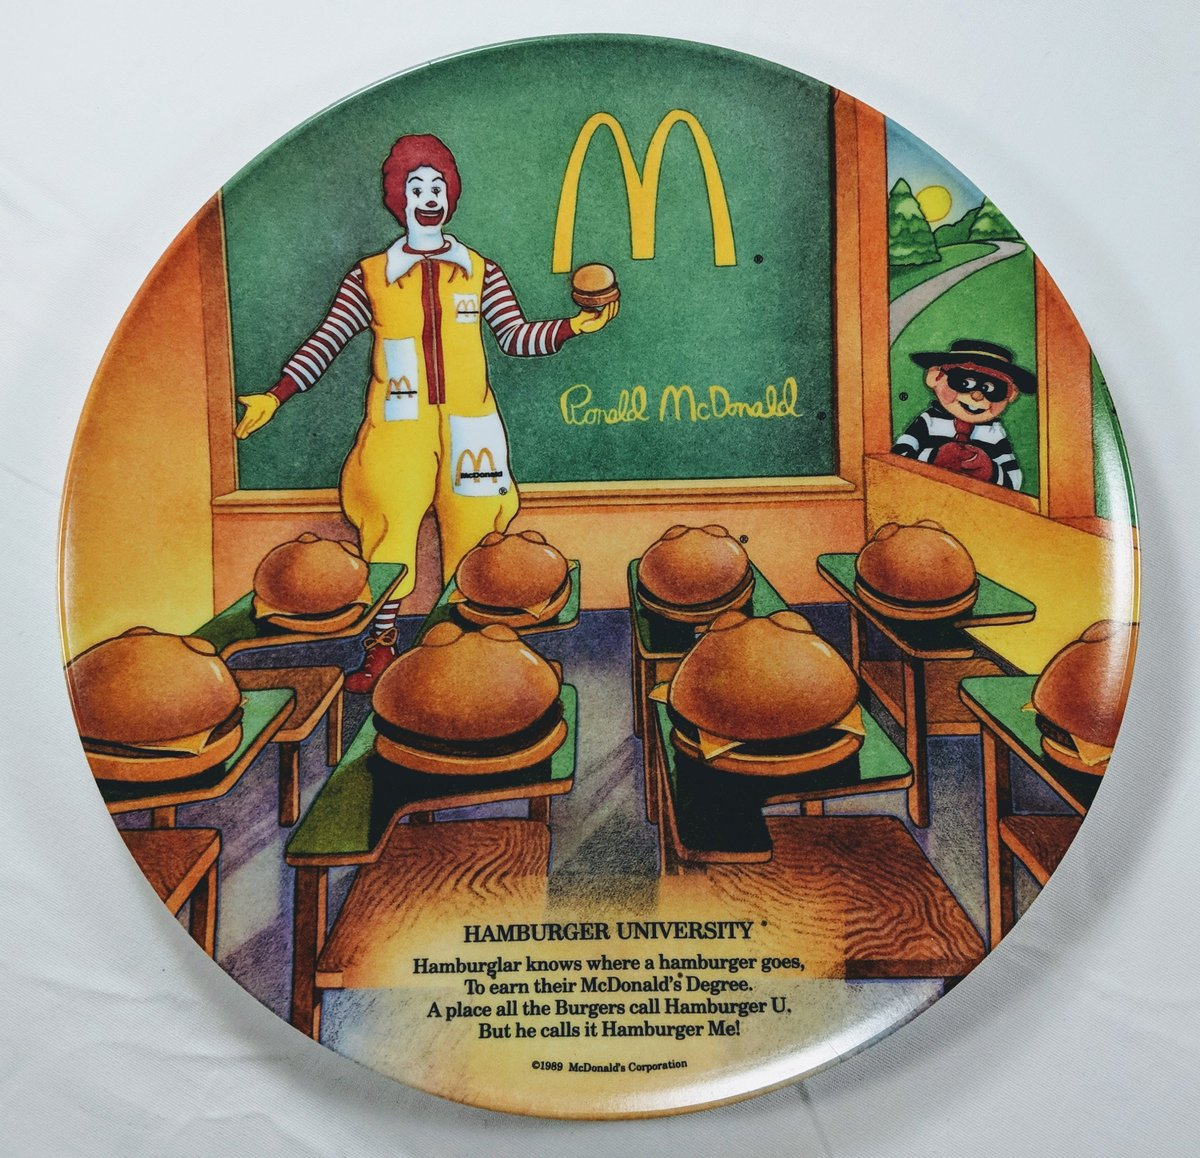 1989 McDonald/'s Plate-Hamburger University VINTAGE